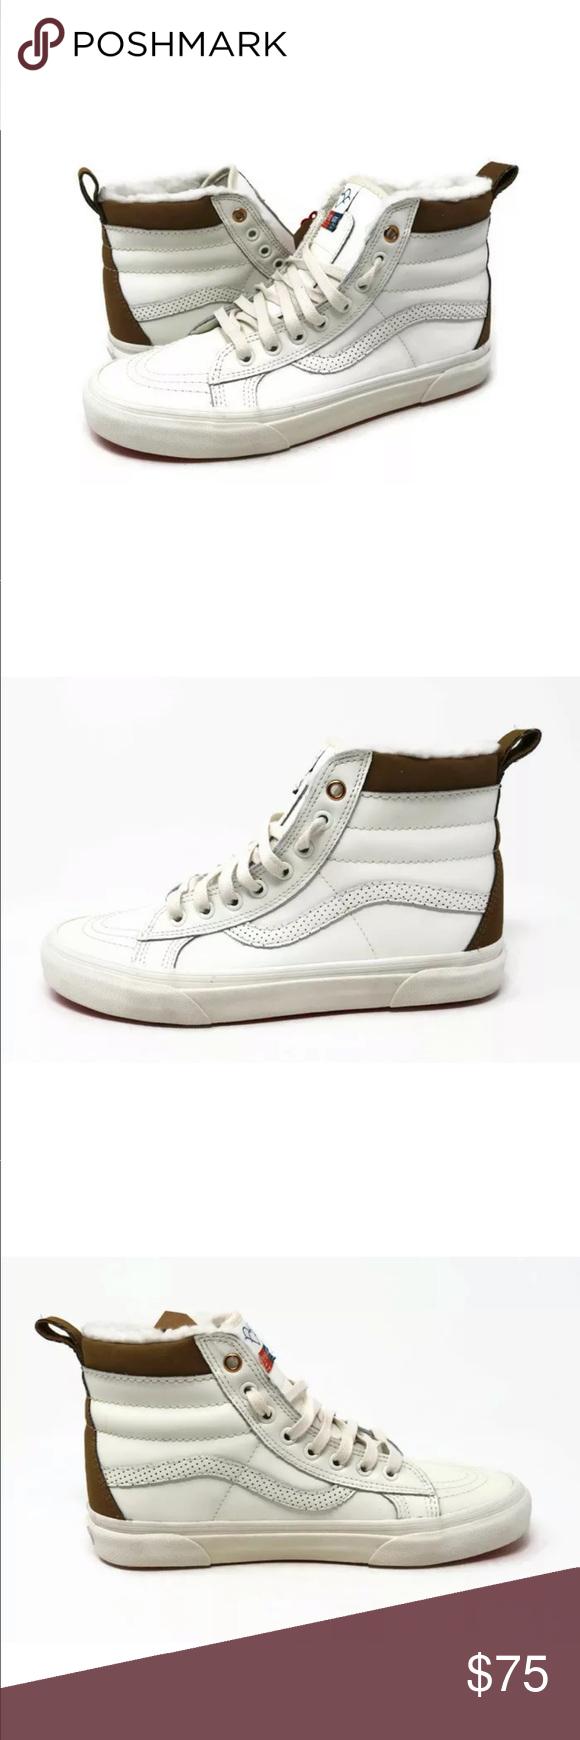 95f4841a34a Vans Sk8-Hi MTE Aimee Fuller White Skate Shoes Vans Sk8-Hi MTE Aimee ...